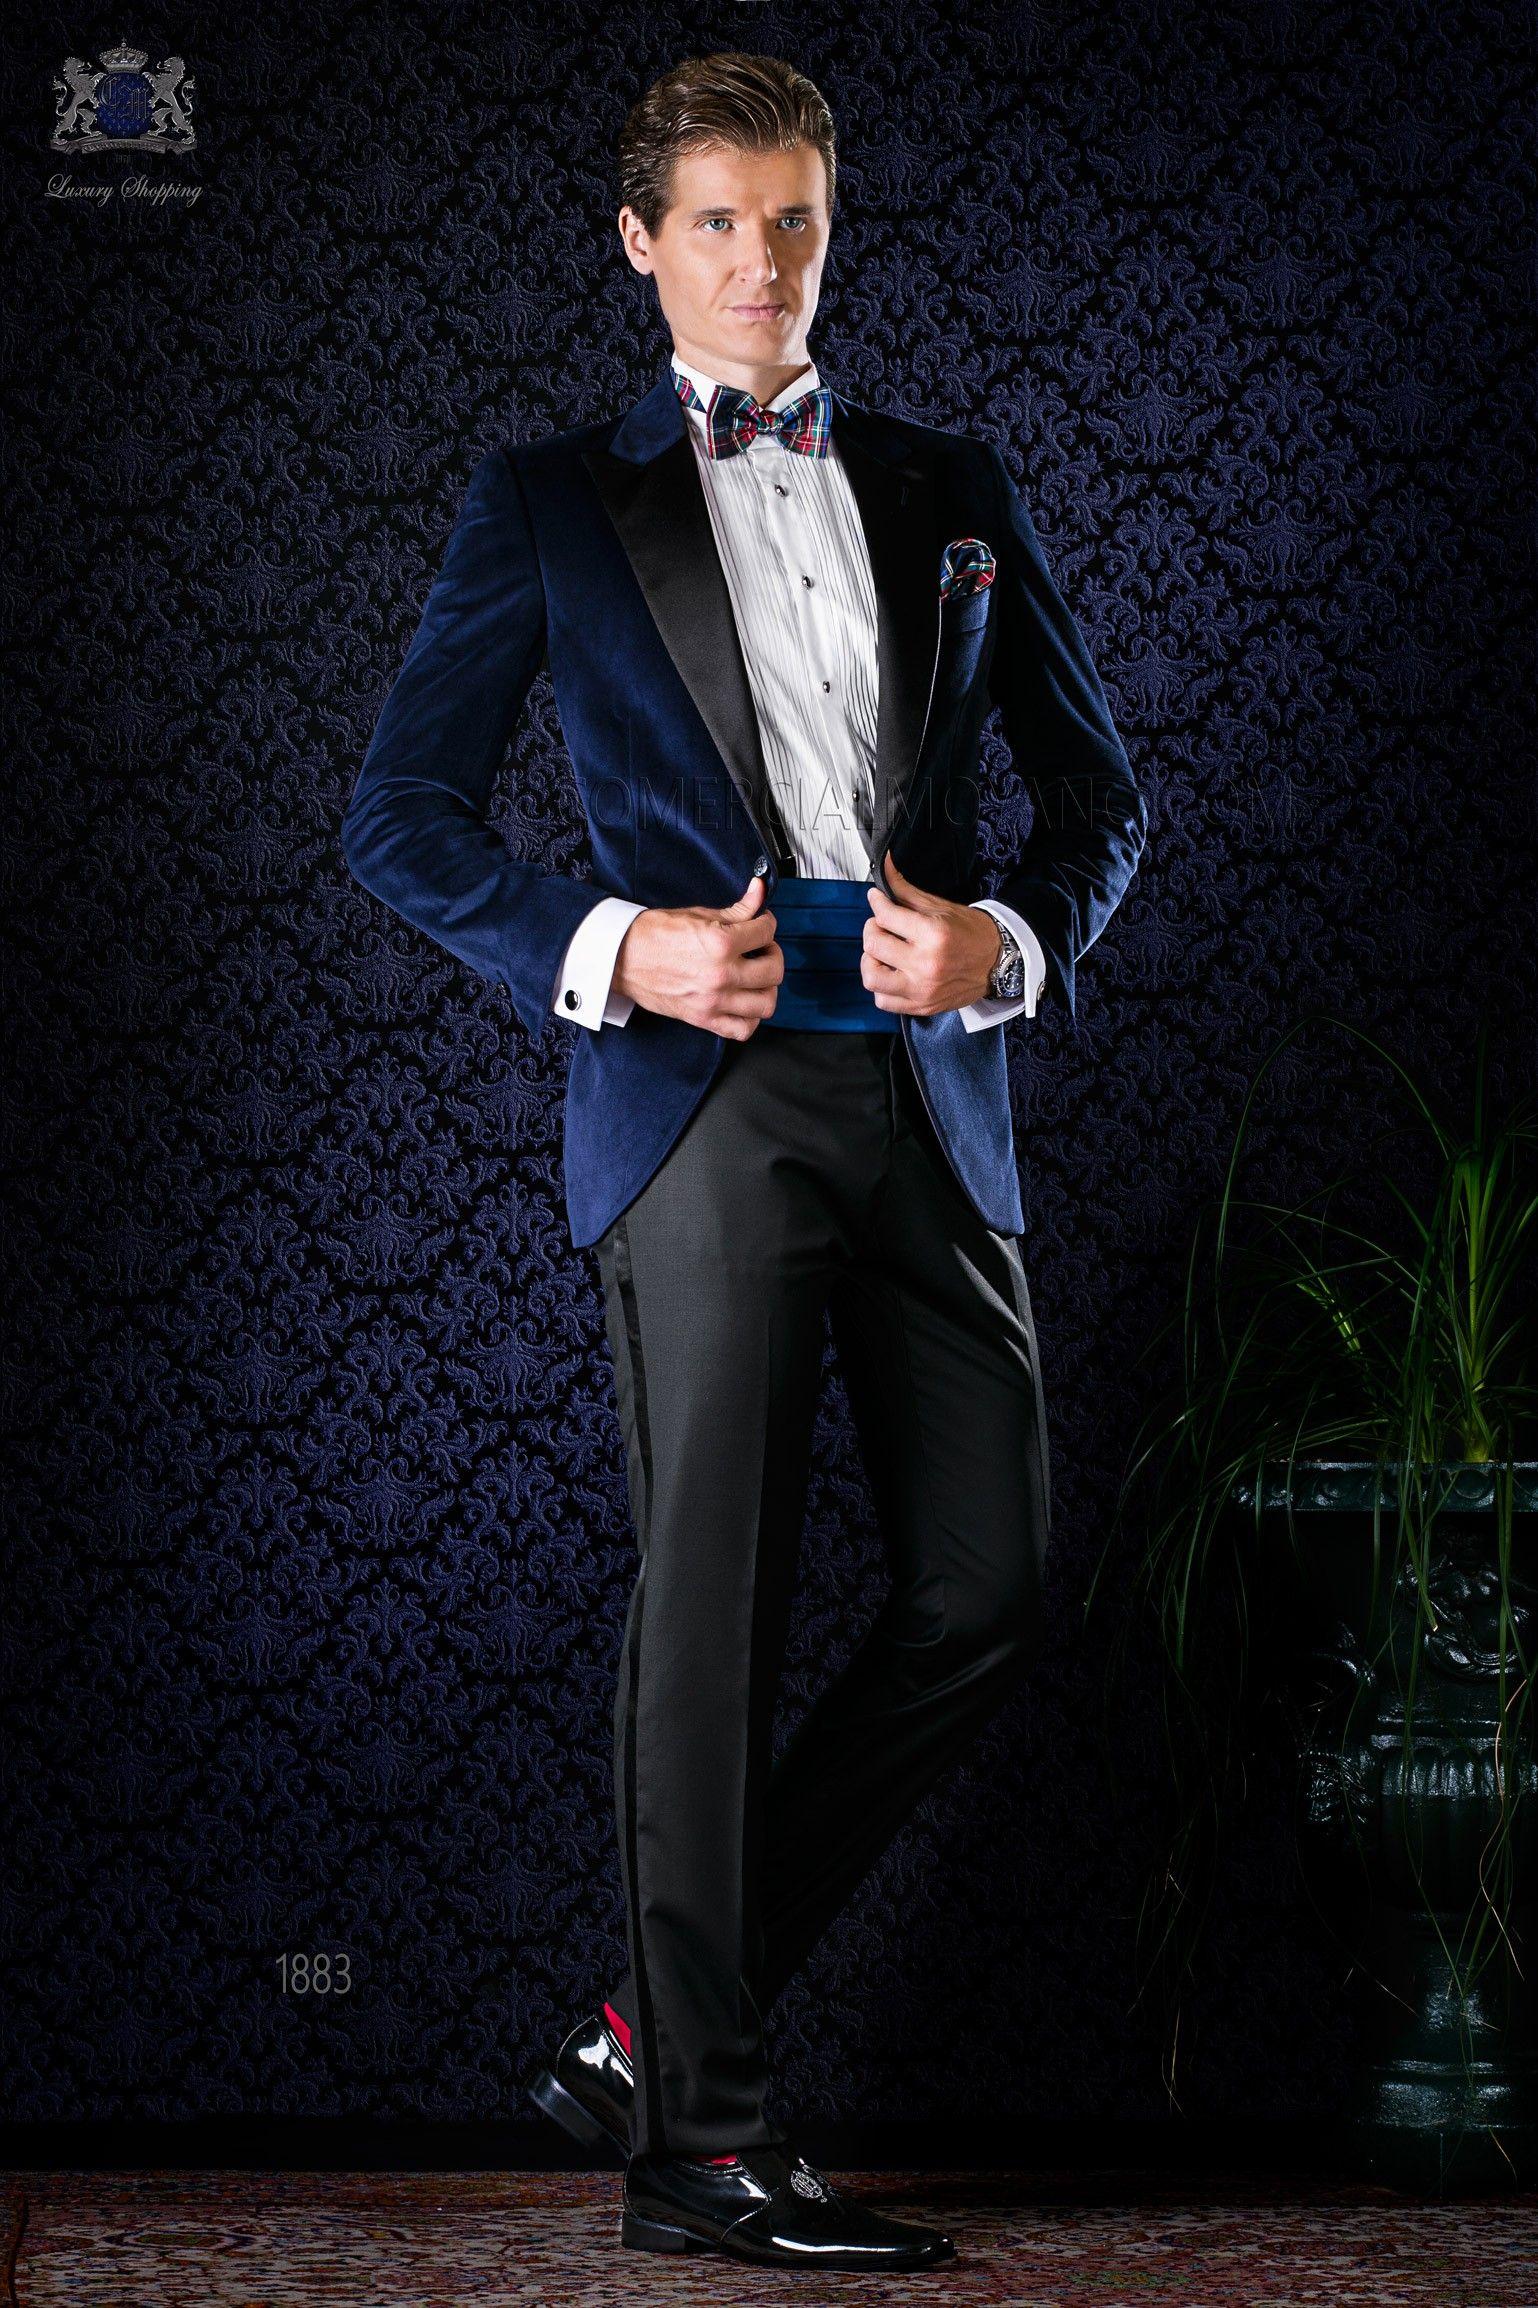 Schwarze hose dunkelblaue jacke